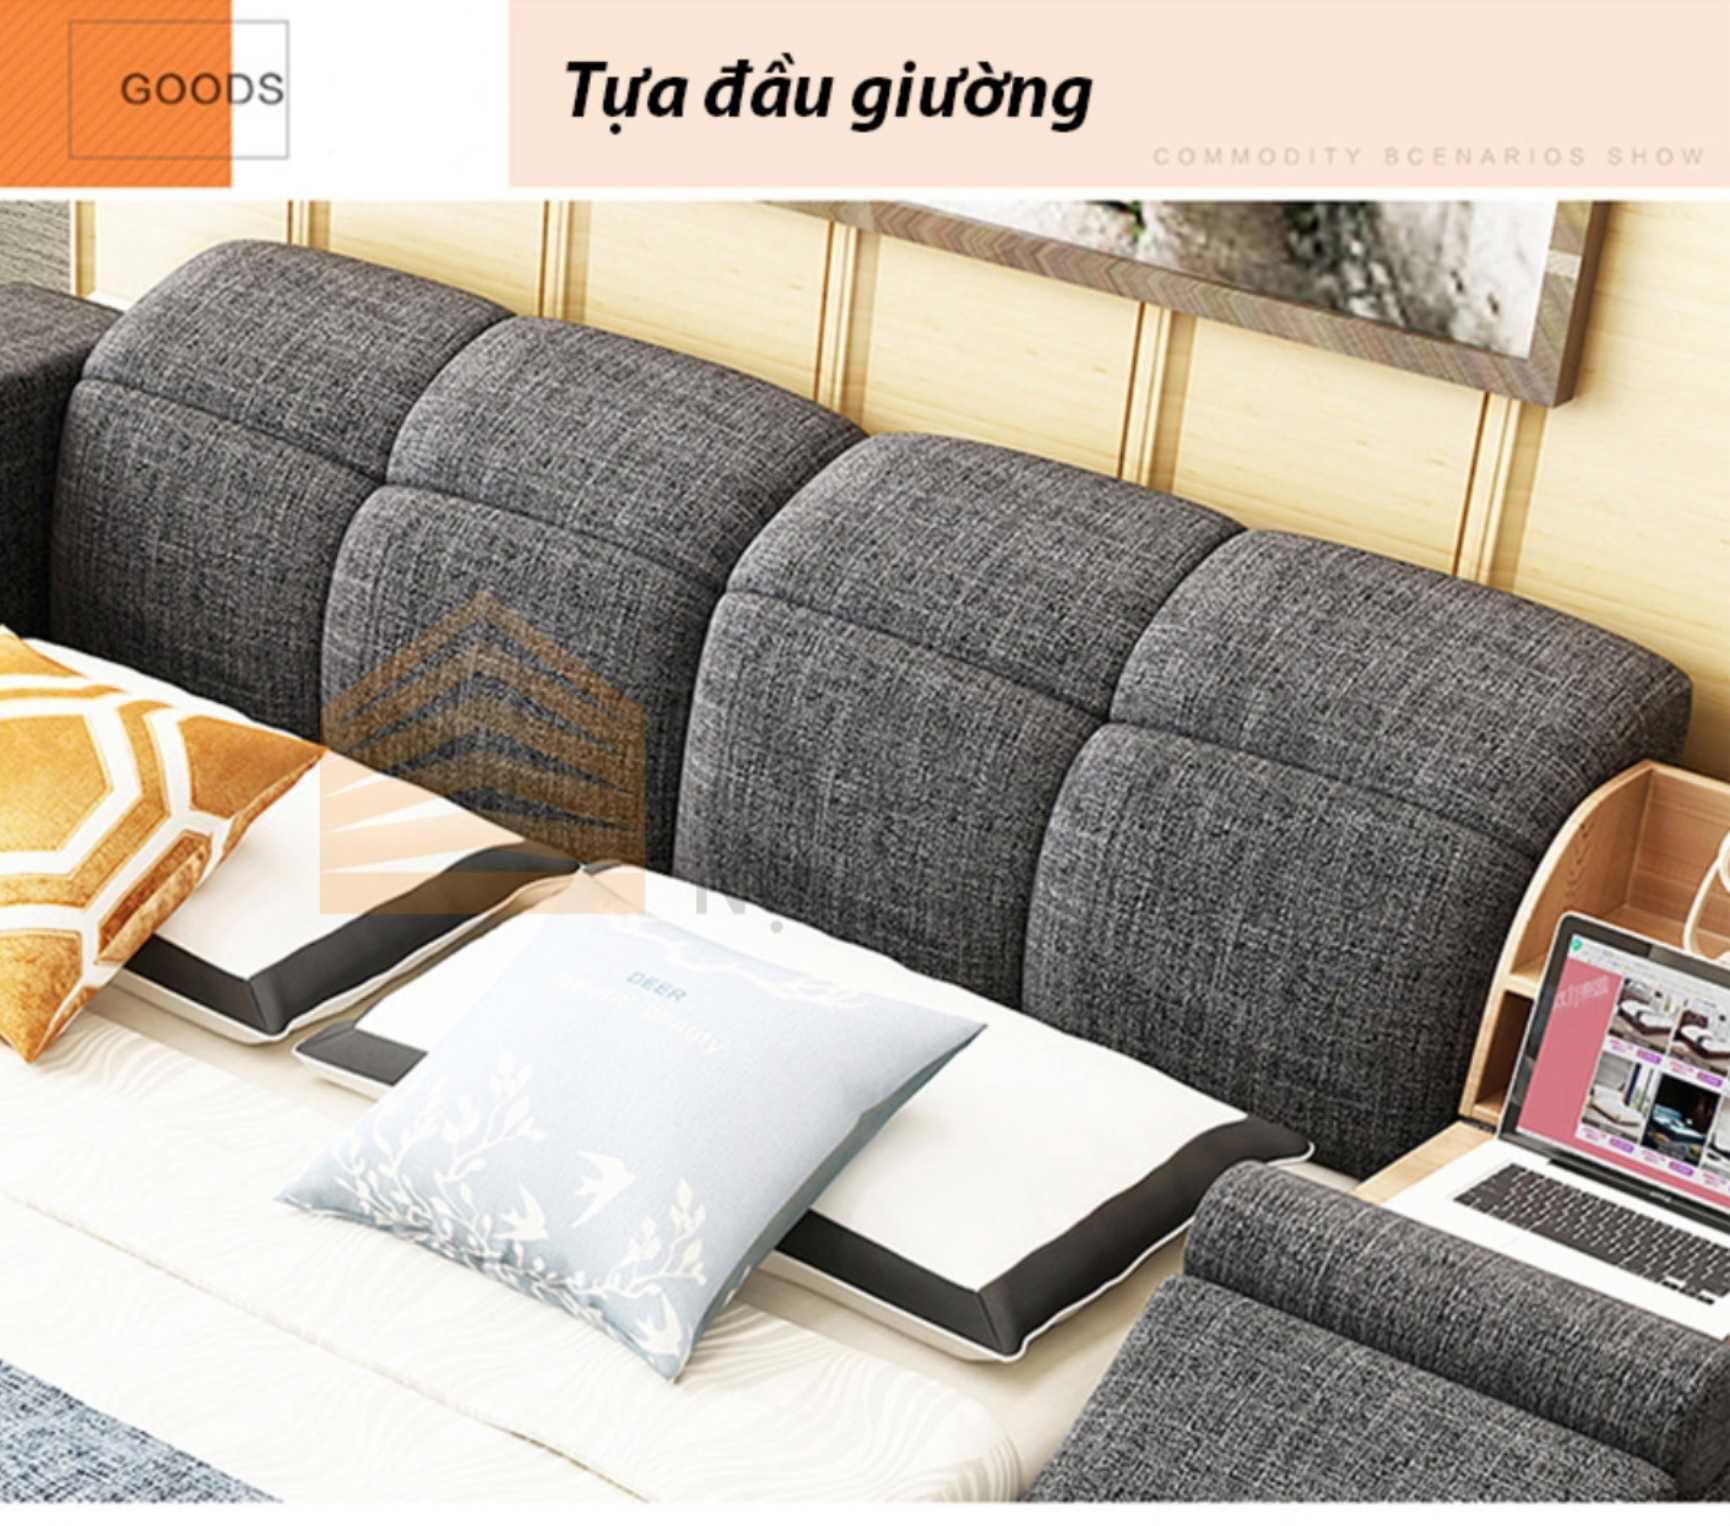 Giường Massage F630, giường massage, giường massage tiện nghi 5